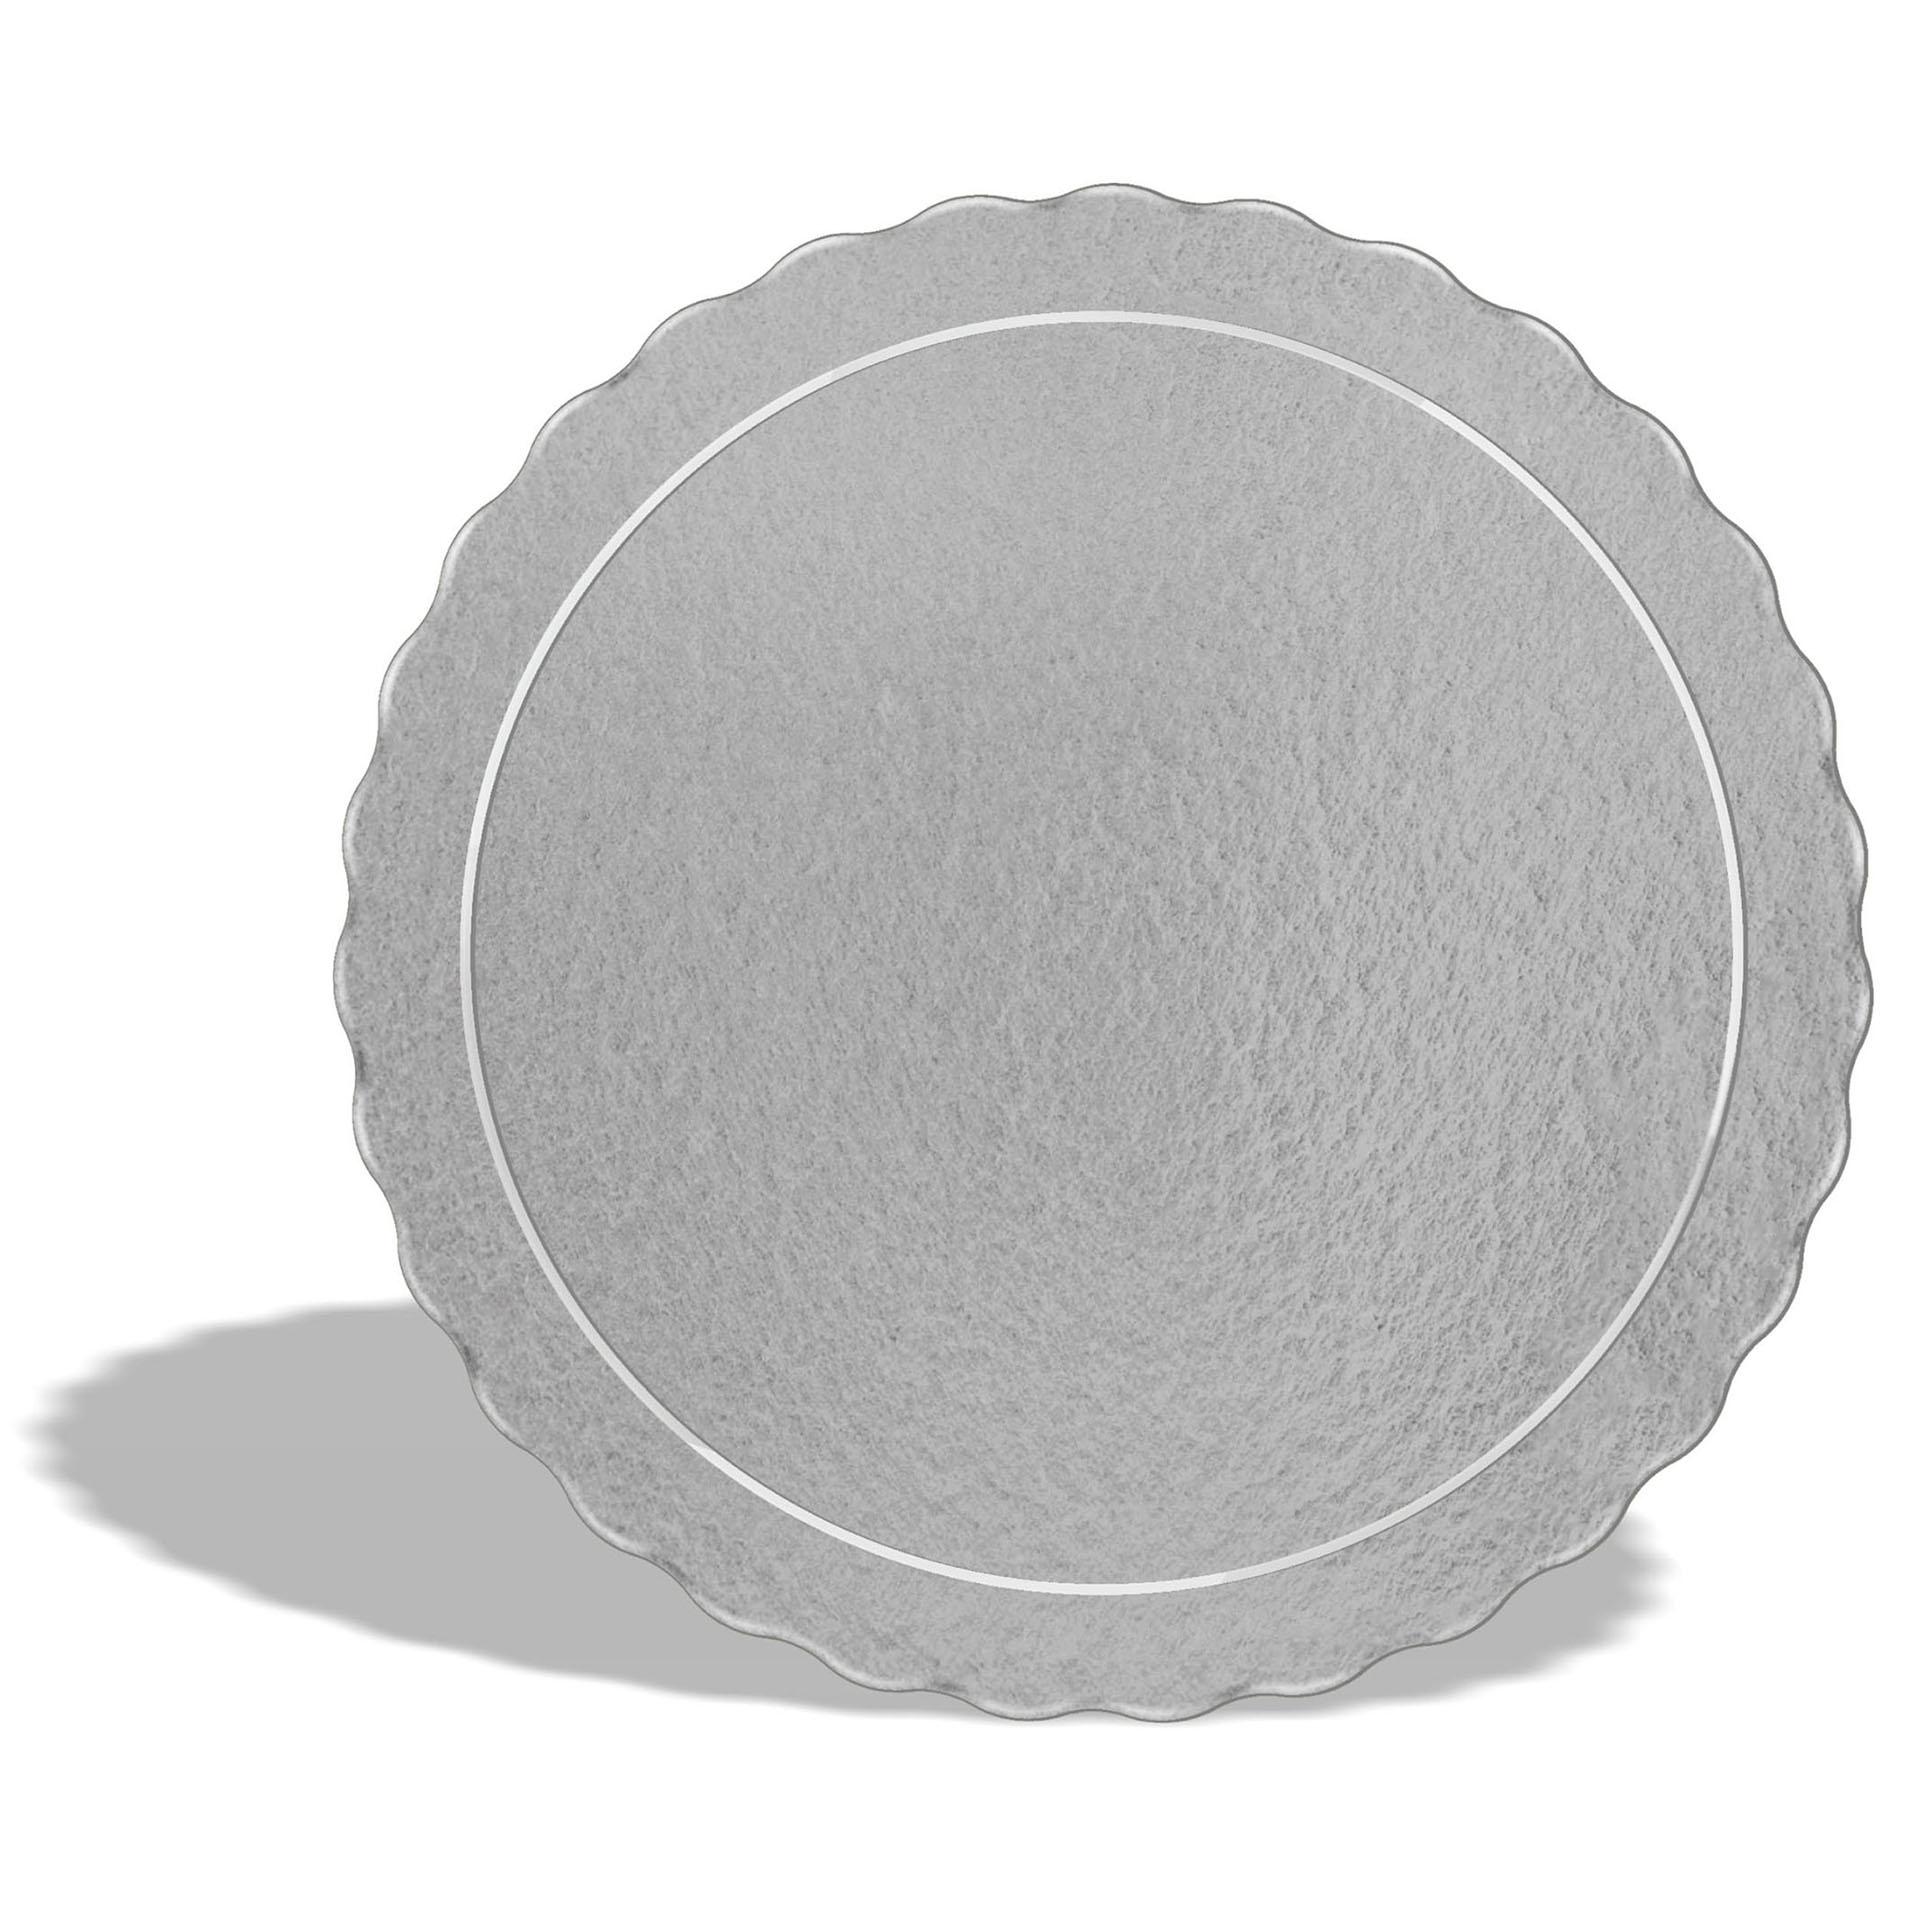 100 Bases Laminadas, Suporte P/ Bolo, Cake Board, 35cm - Prata